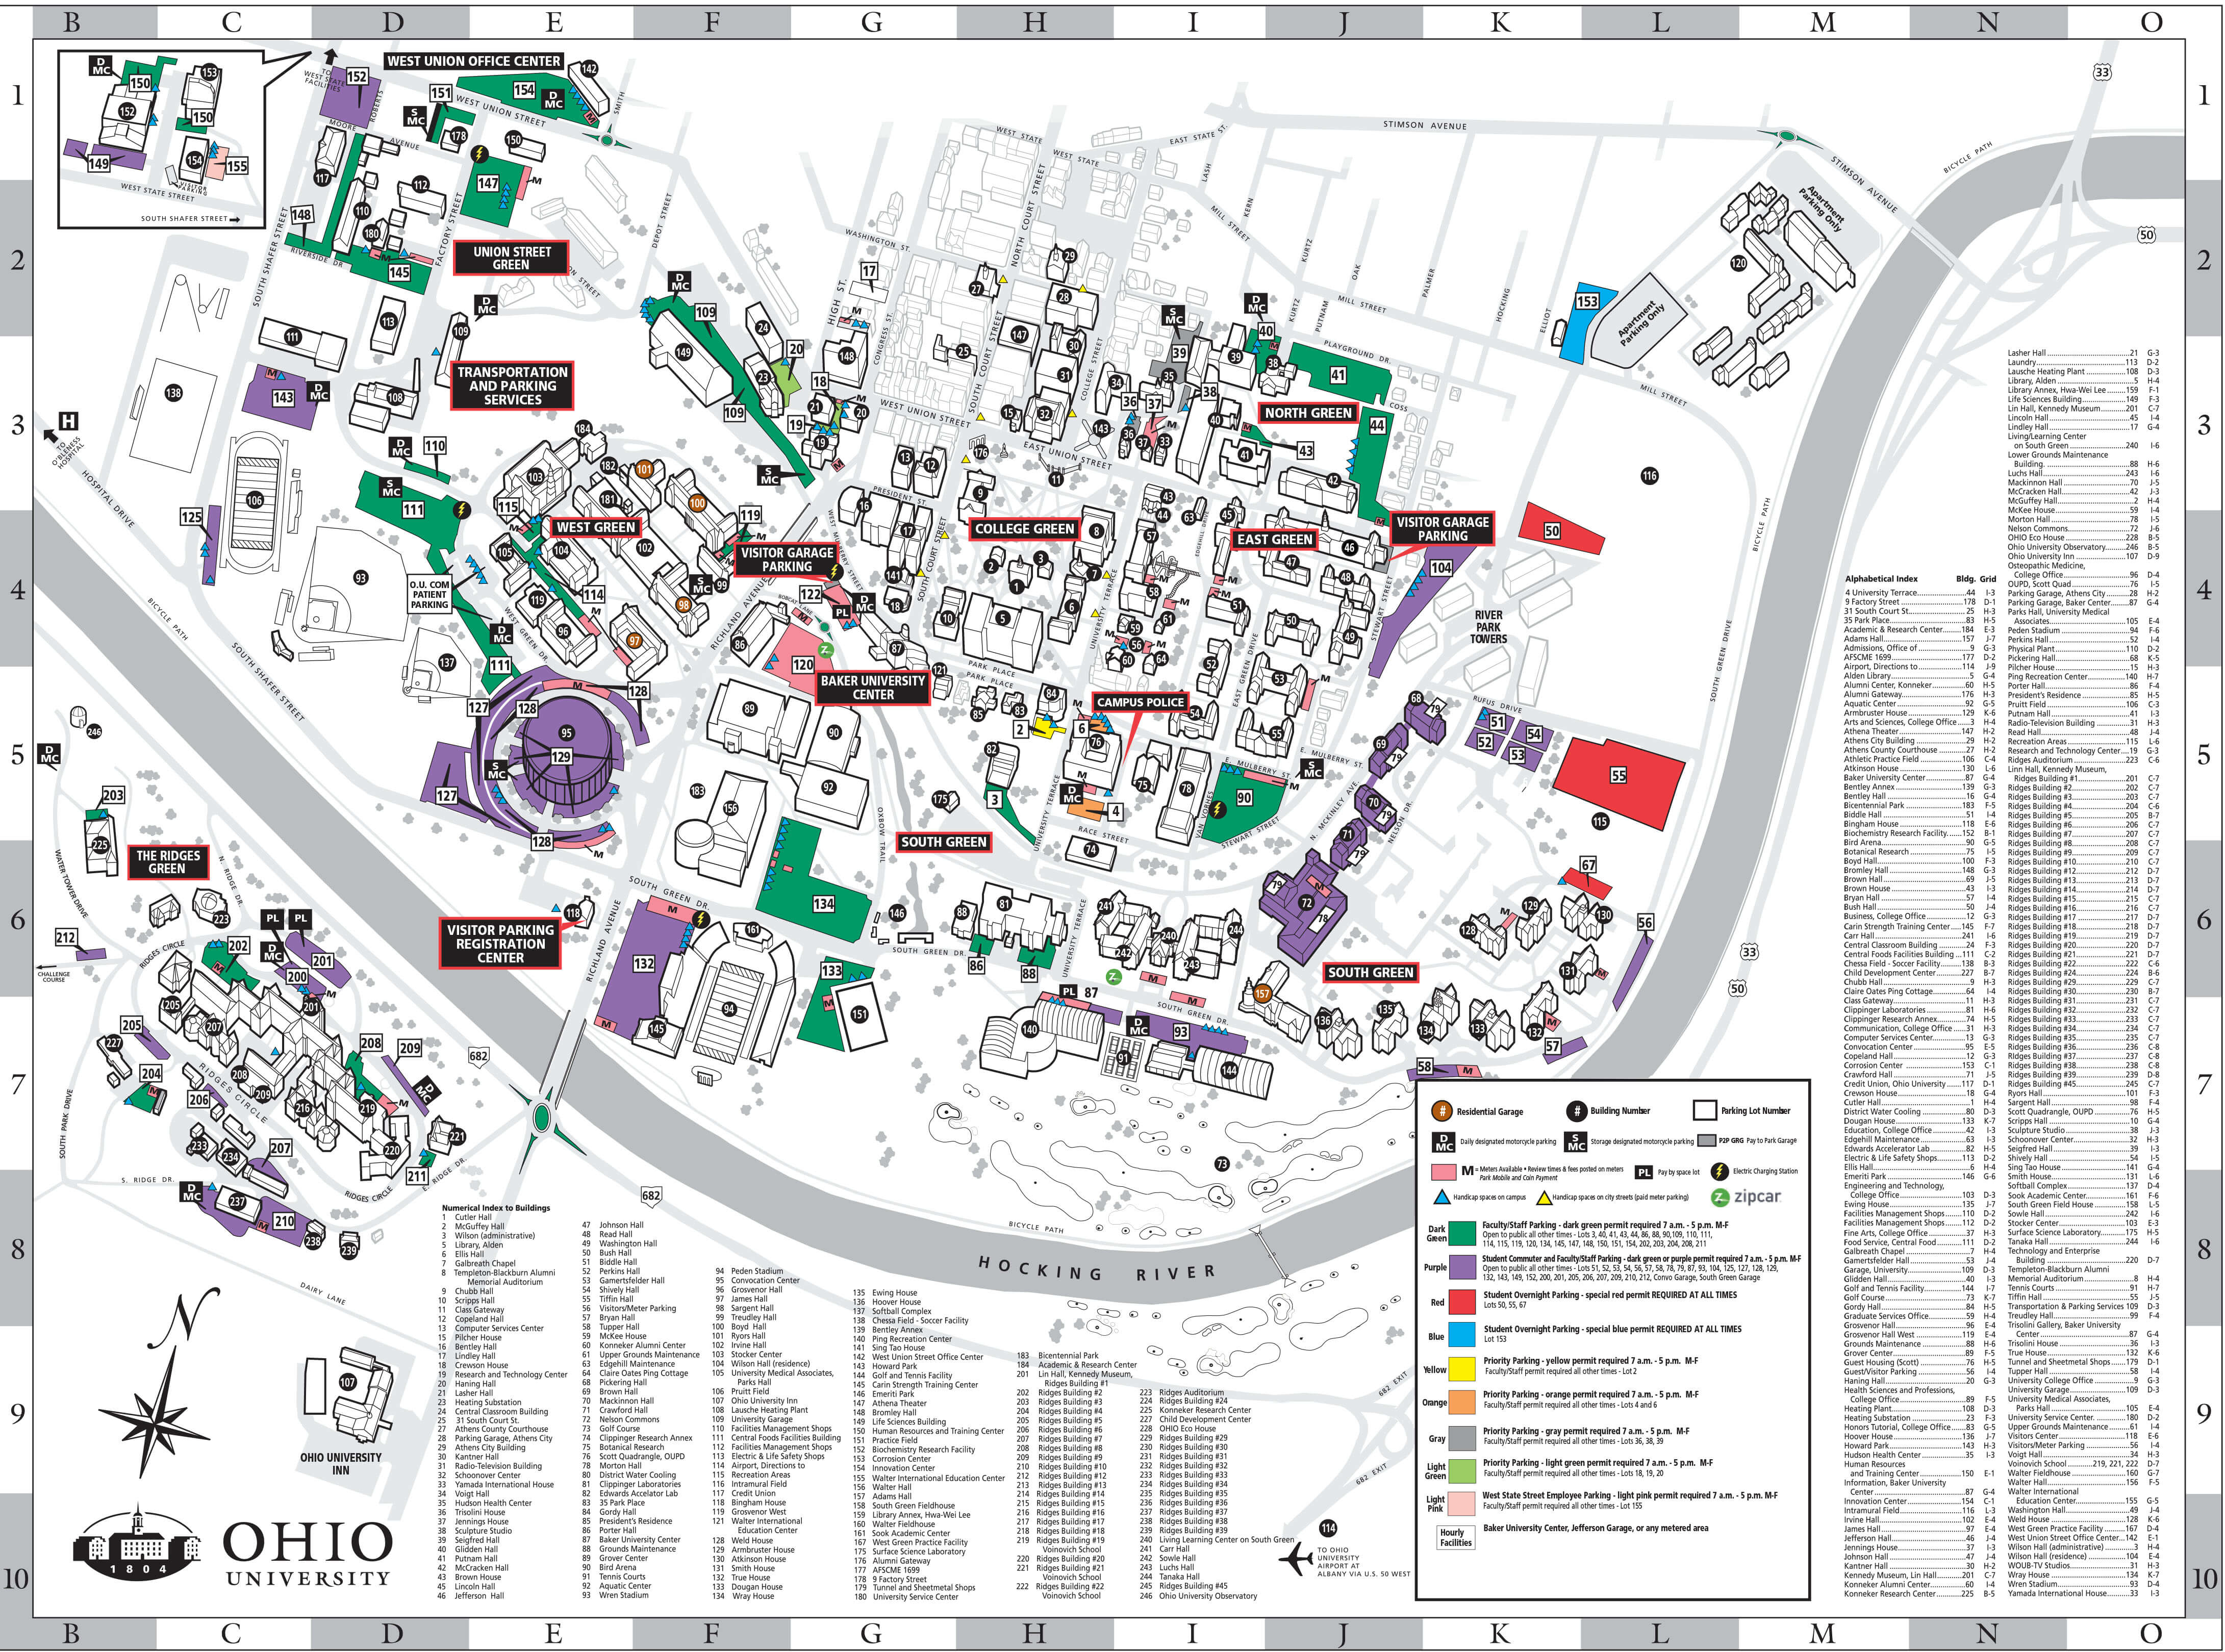 athens campus parking map